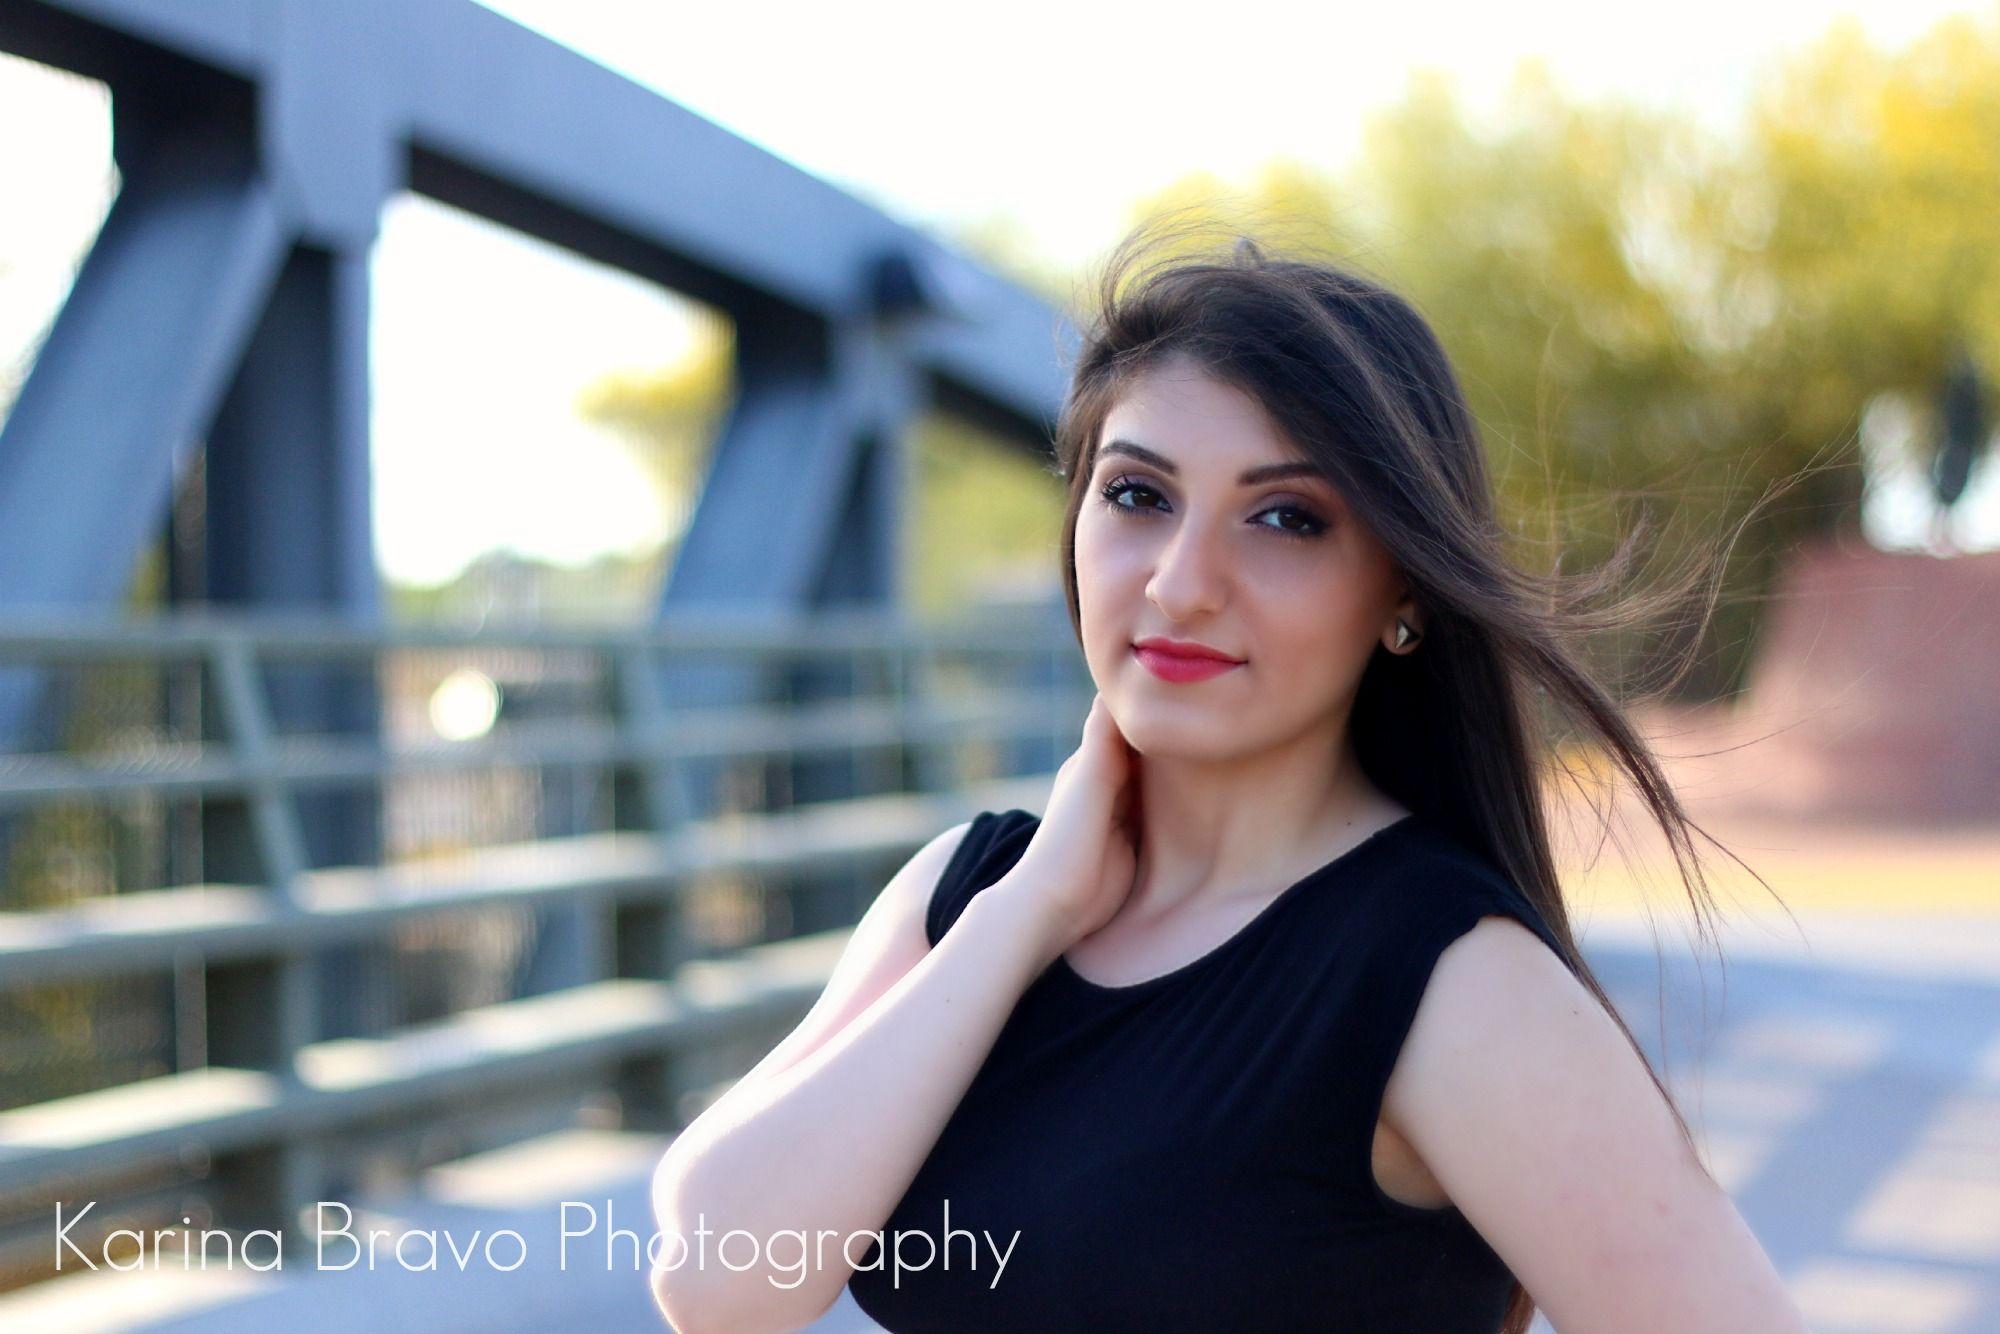 efe516c56d2 20 Best Karina Bravo Photography images